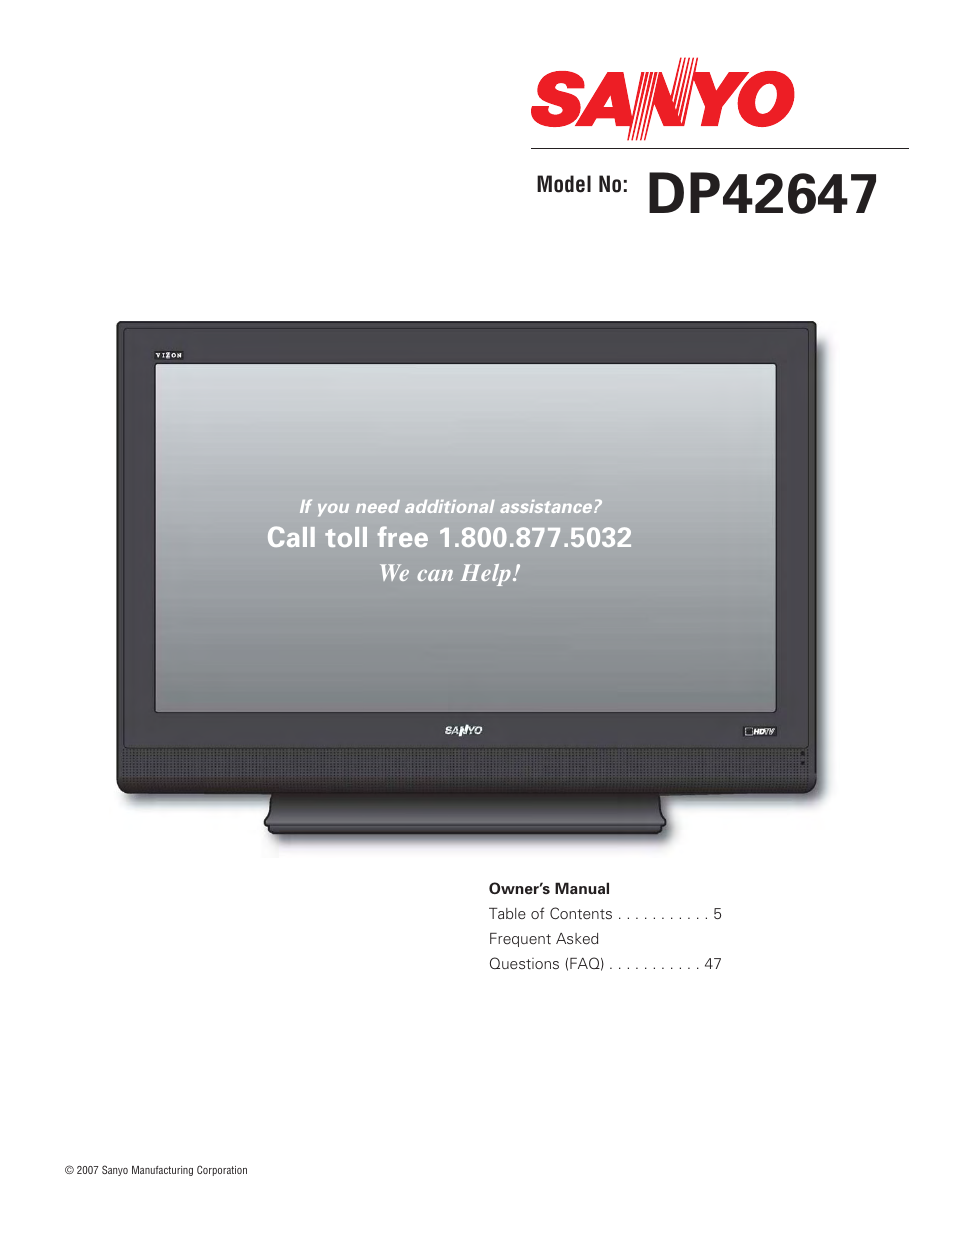 sanyo dp42647 user manual 48 pages rh manualsdir com Sanyo Flat Screen TV Manual Sanyo Repair Manual